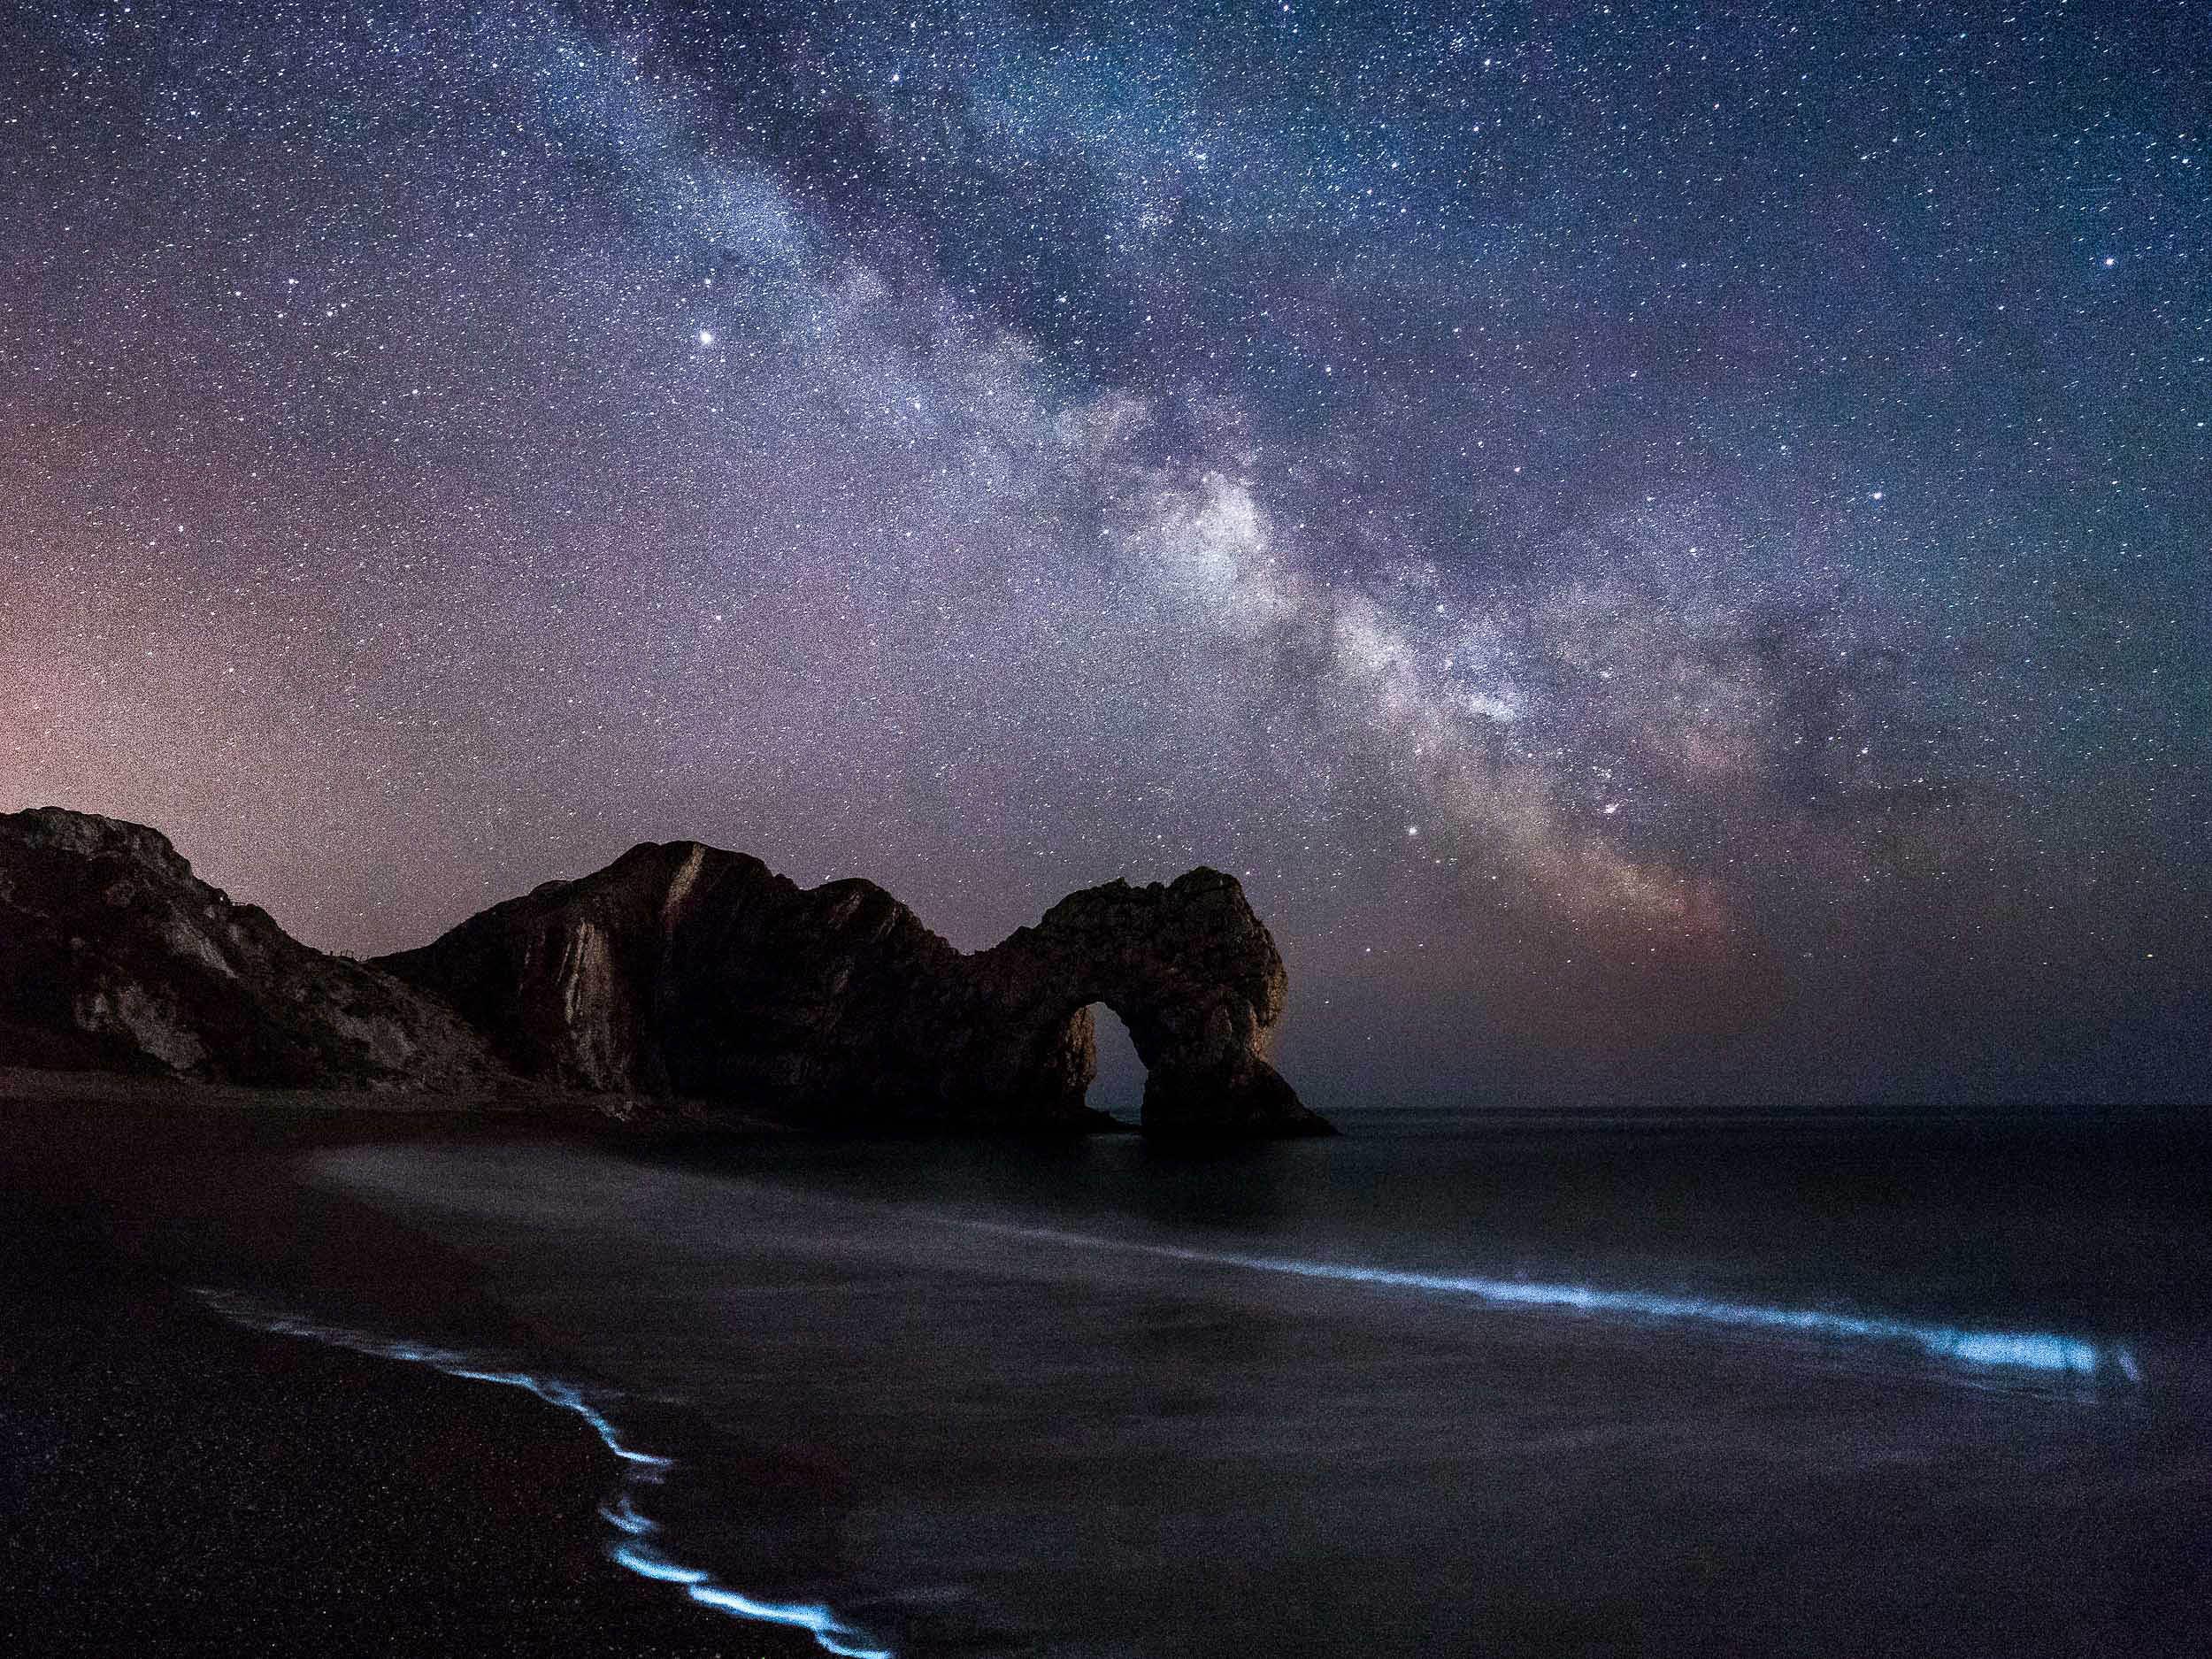 Milky Way and Blue Light at Durdle Door Dorset